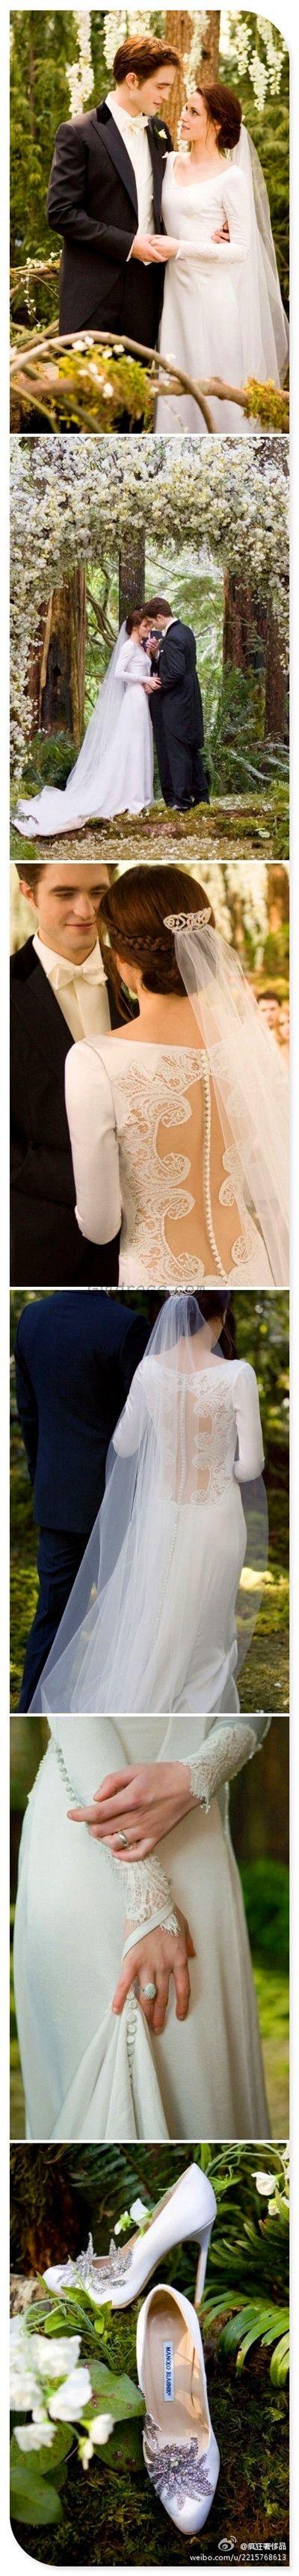 Bella's wedding dress in breaking dawn  Vintage wedding dress Vintage wedding dresses  Twilight saga